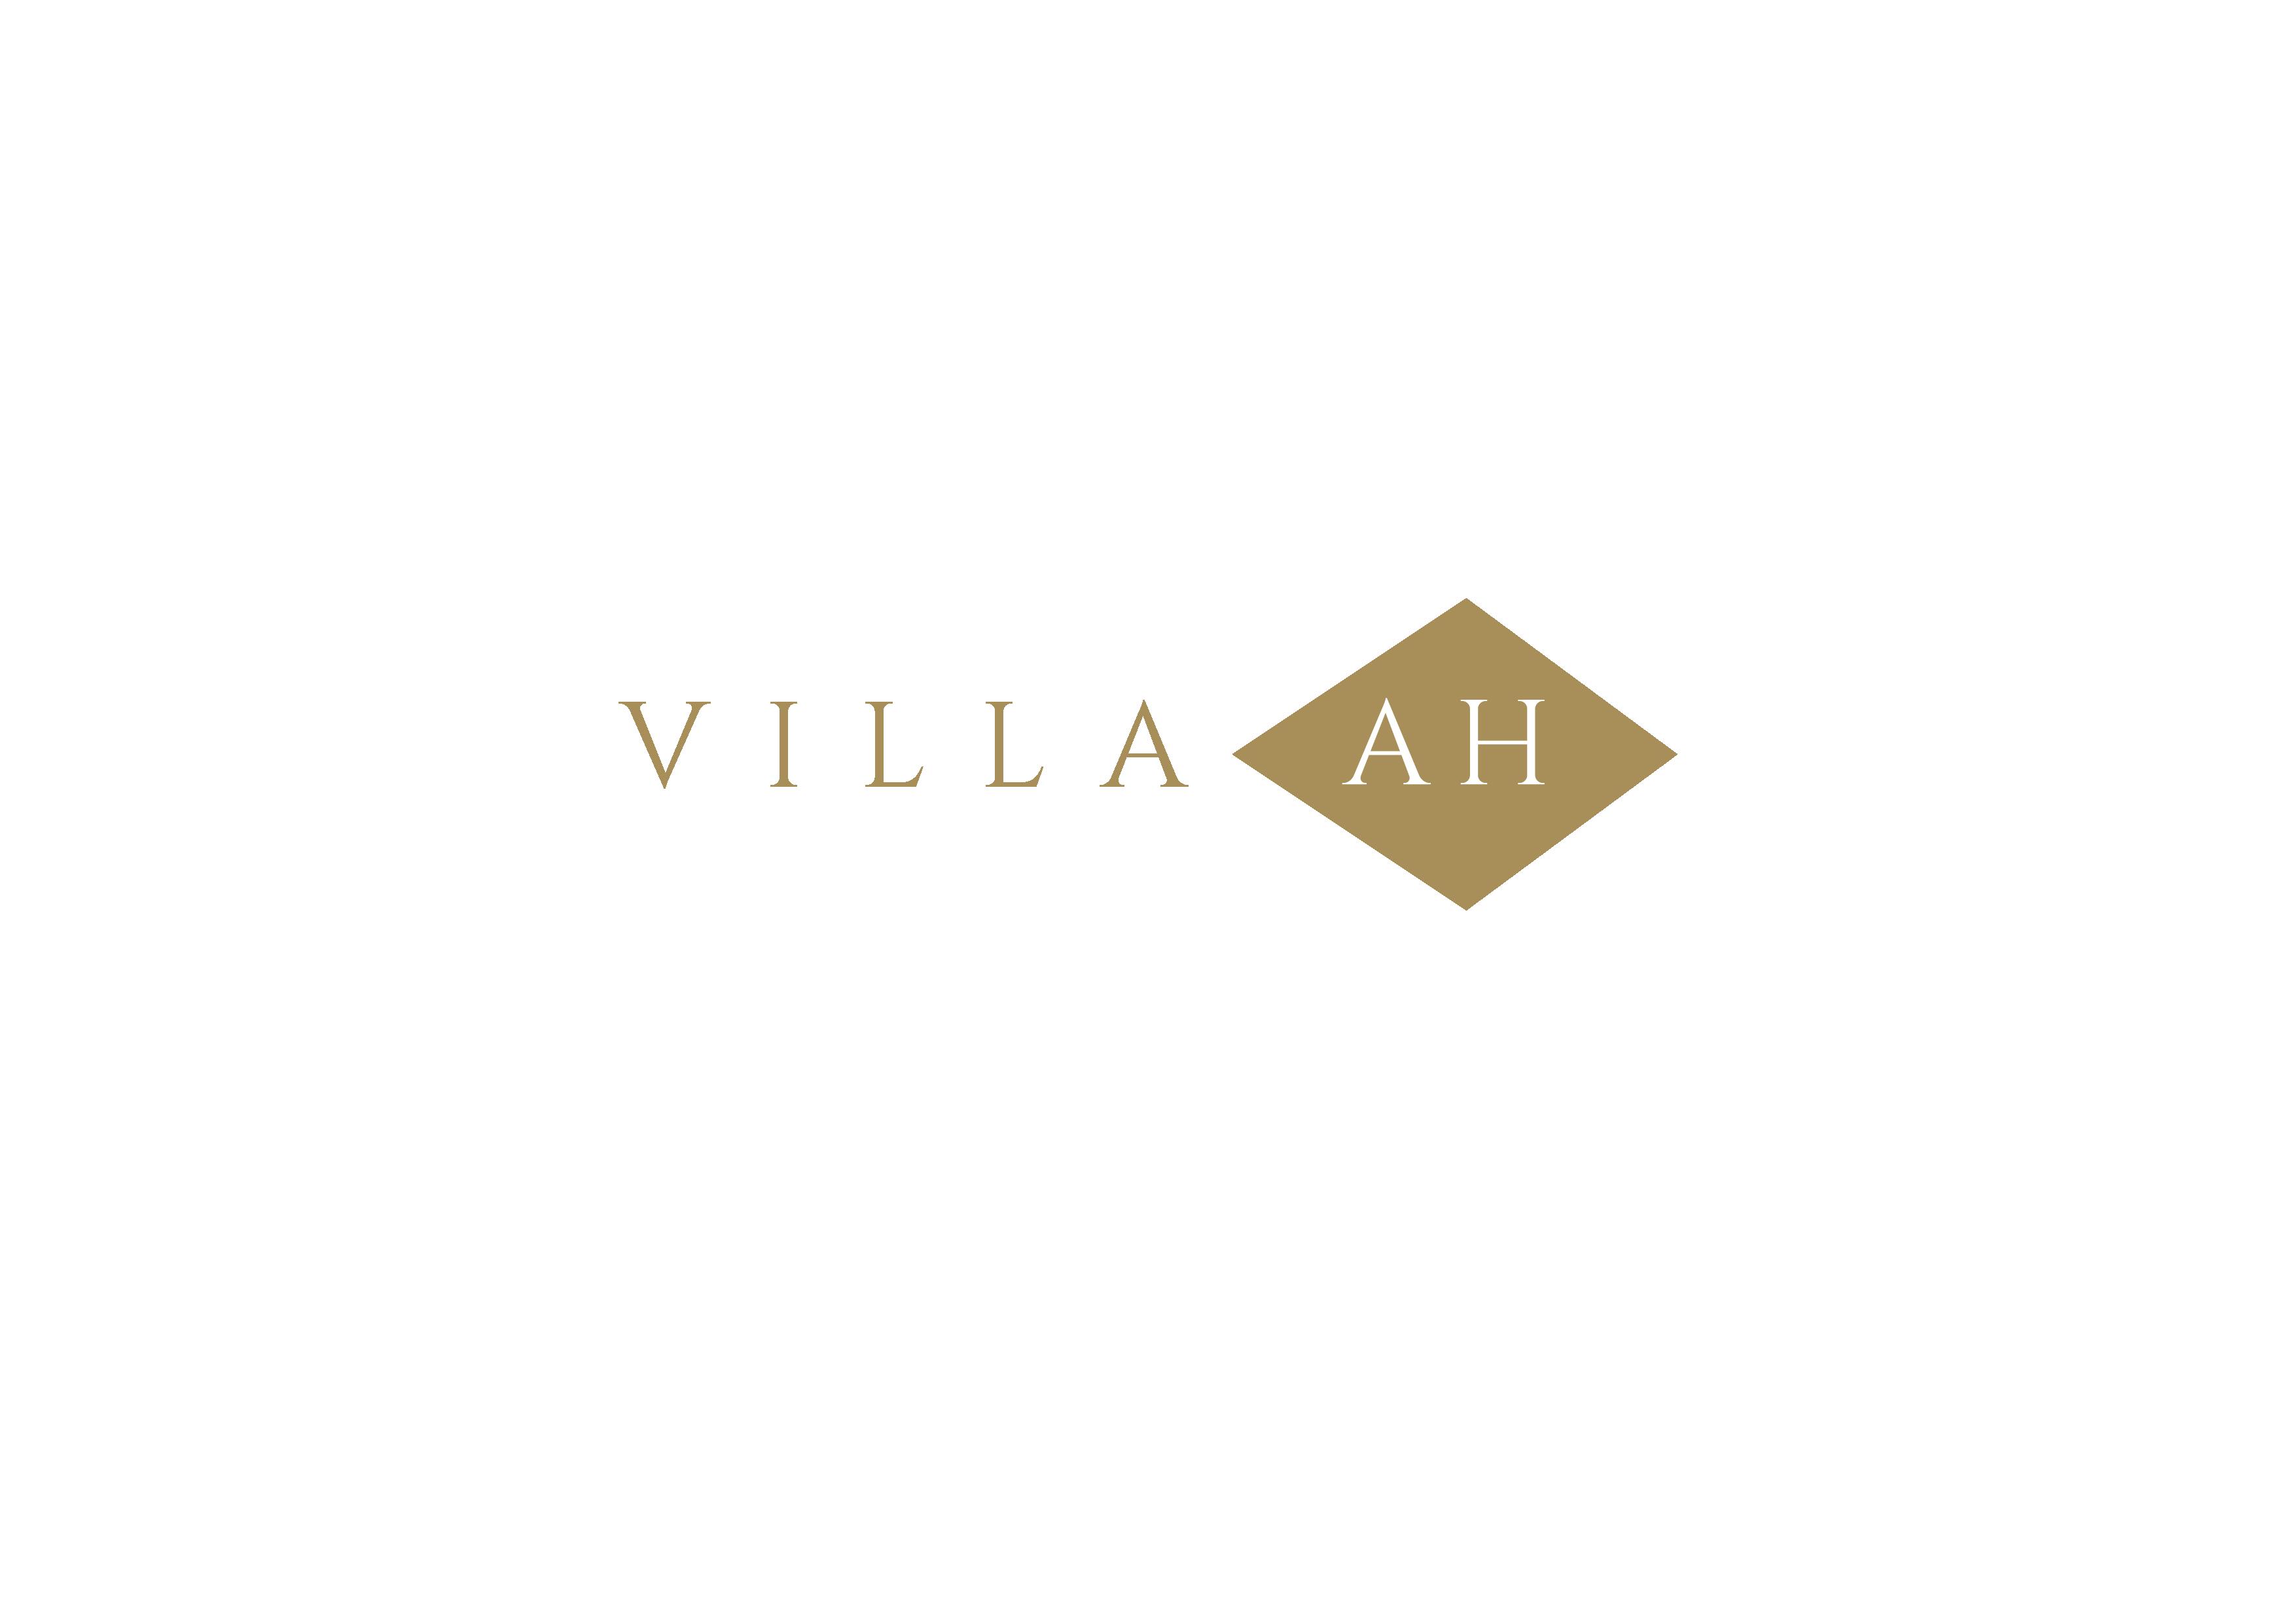 villa-cannes-evenementiel-rp-festival-de-cannes-cinema-croisette-branding-logotype-gold-01